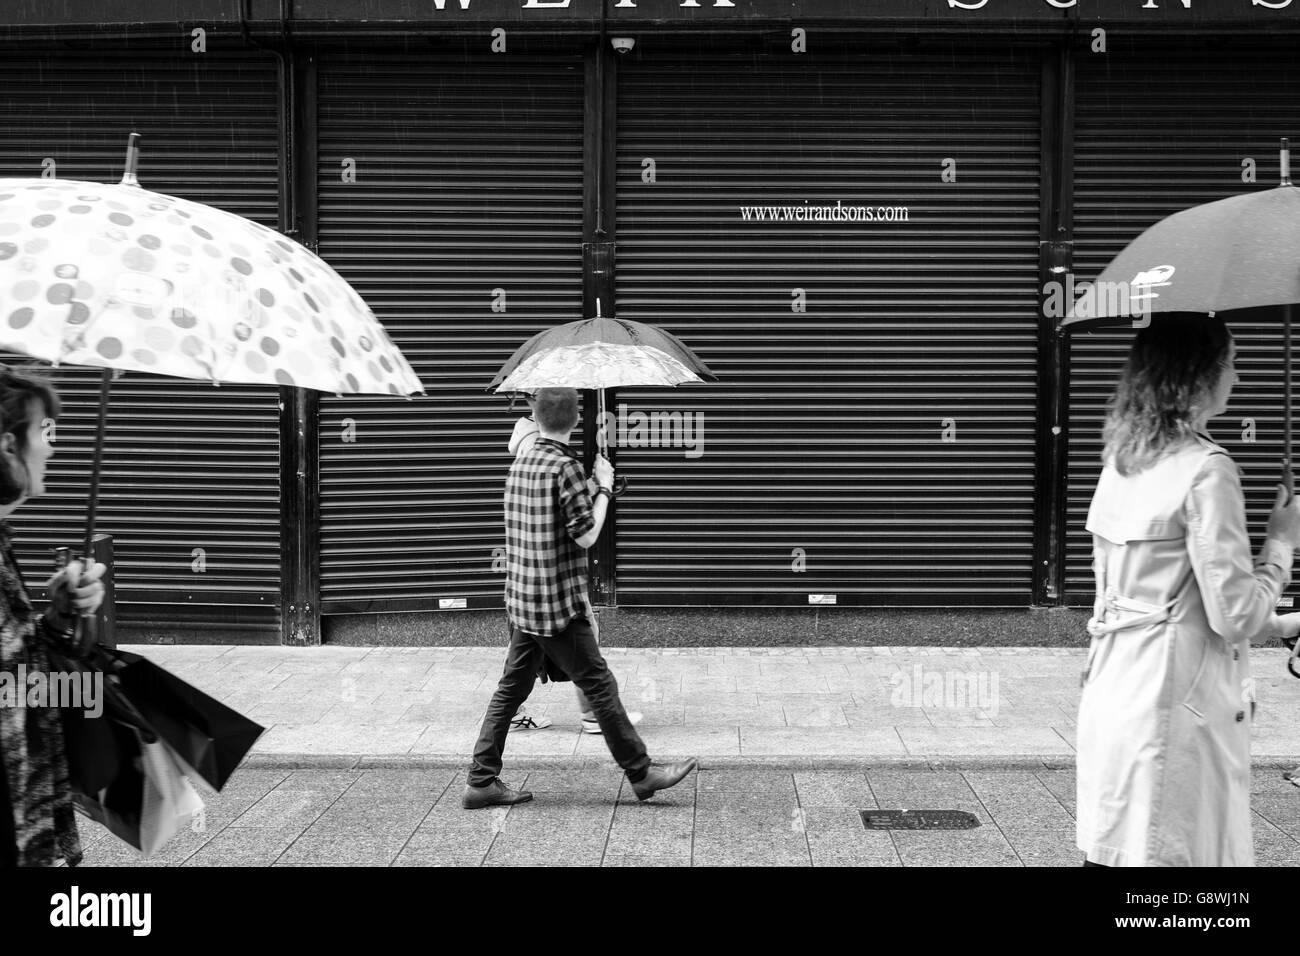 Rainy day in Dublin [monochrome] - Stock Image